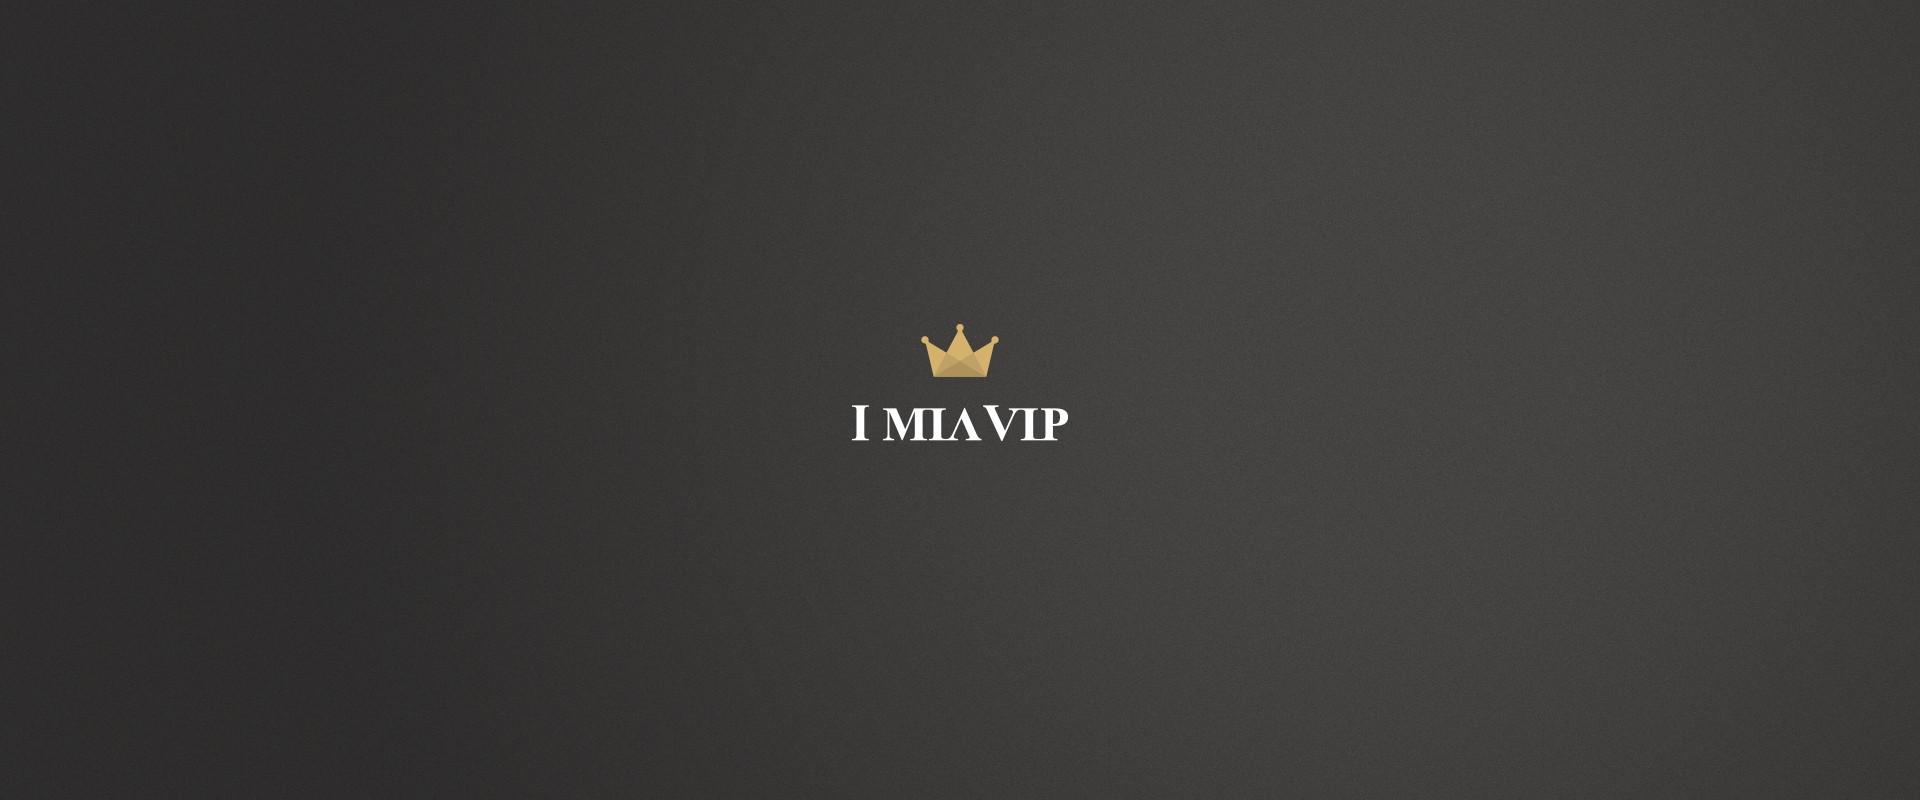 Logotipo I Mia Vip